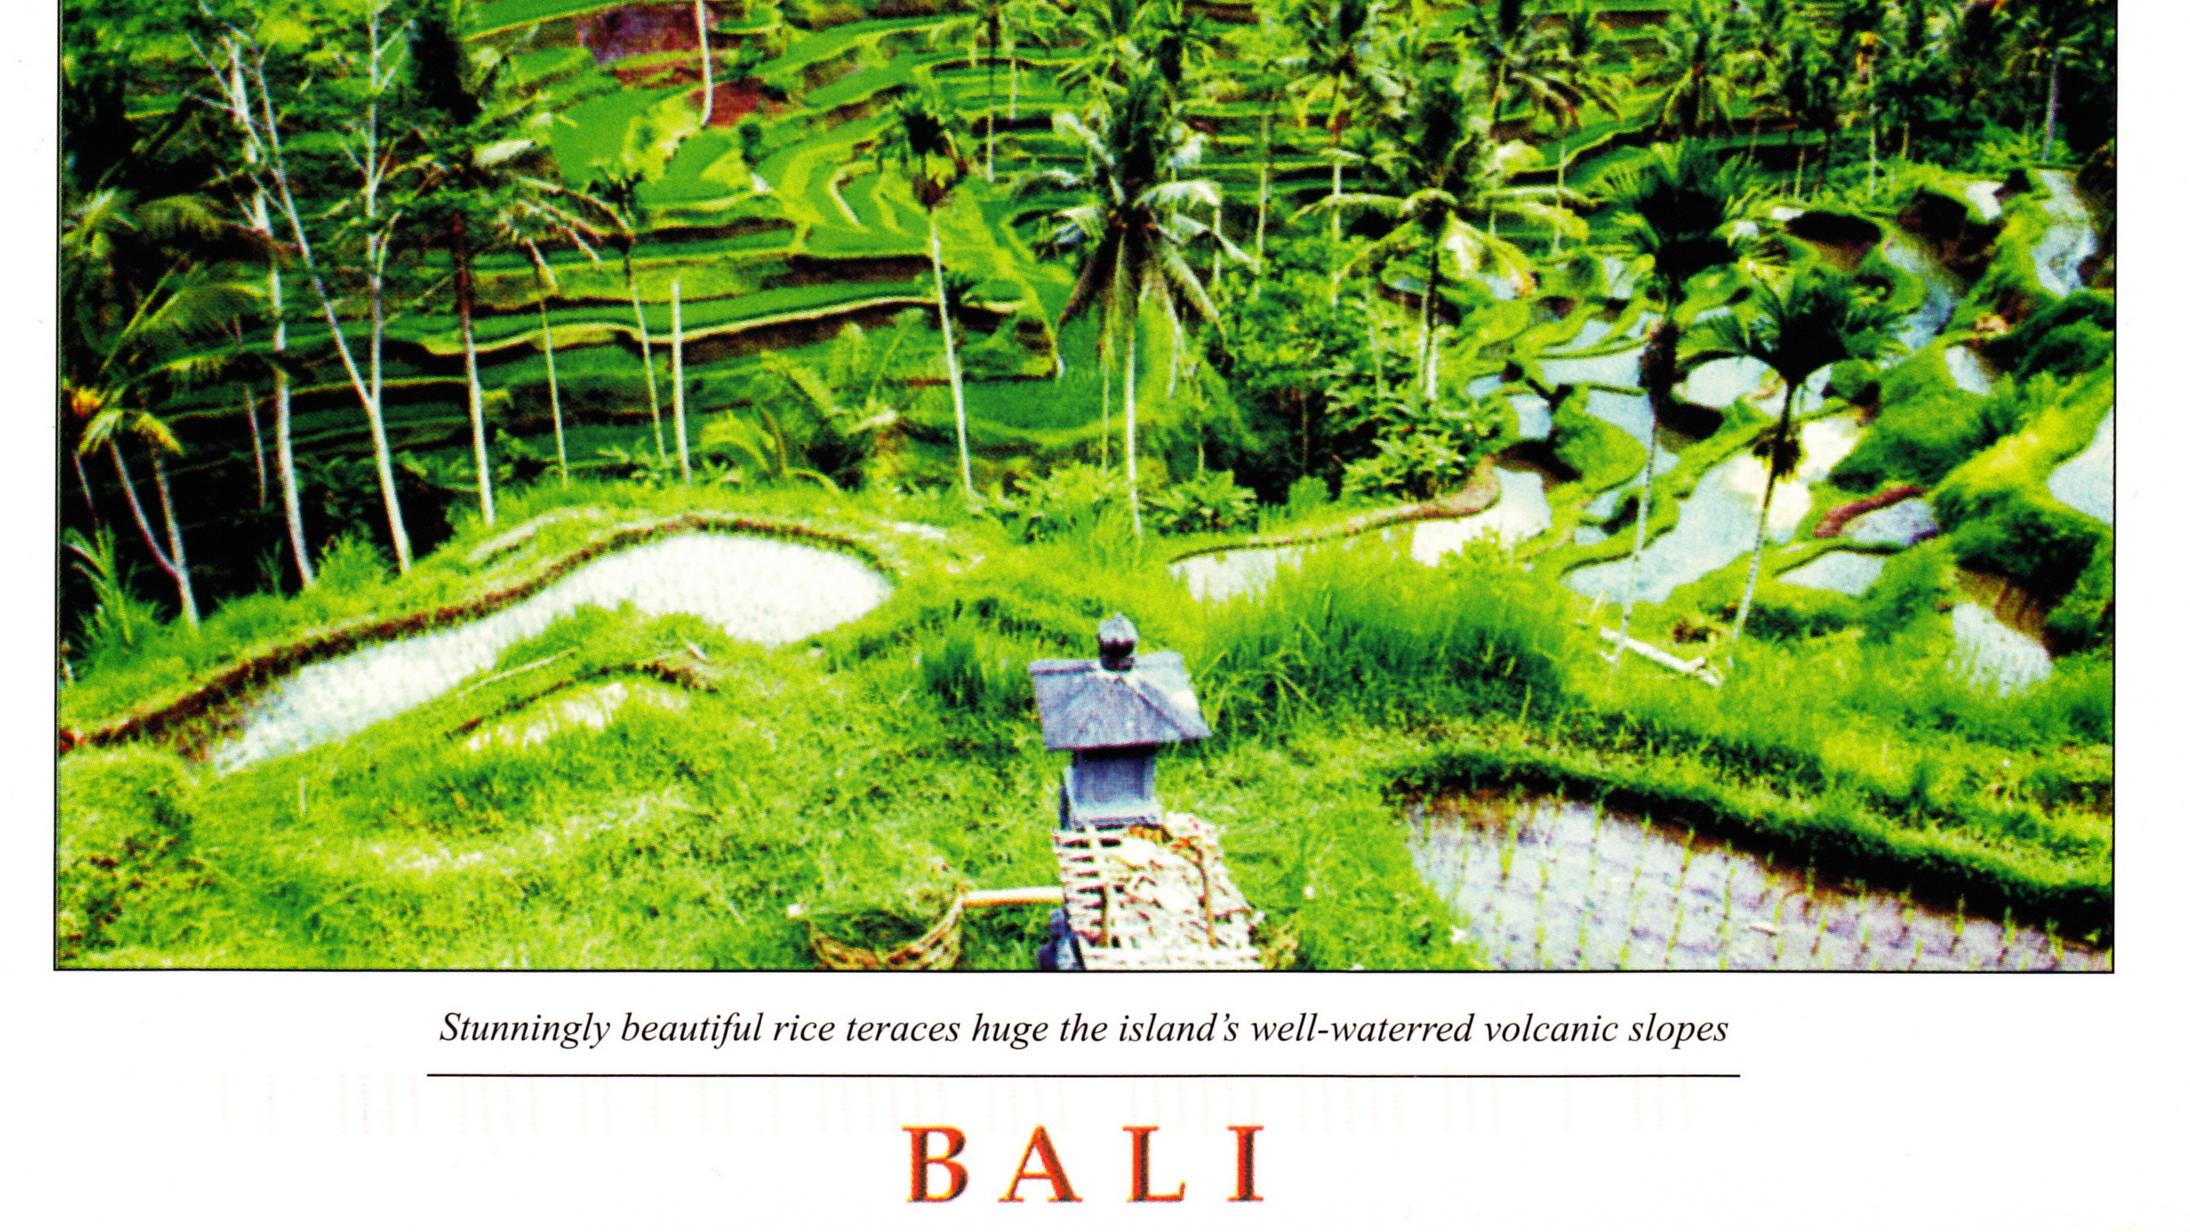 rice-terraces-in-bali-1523052249.jpg